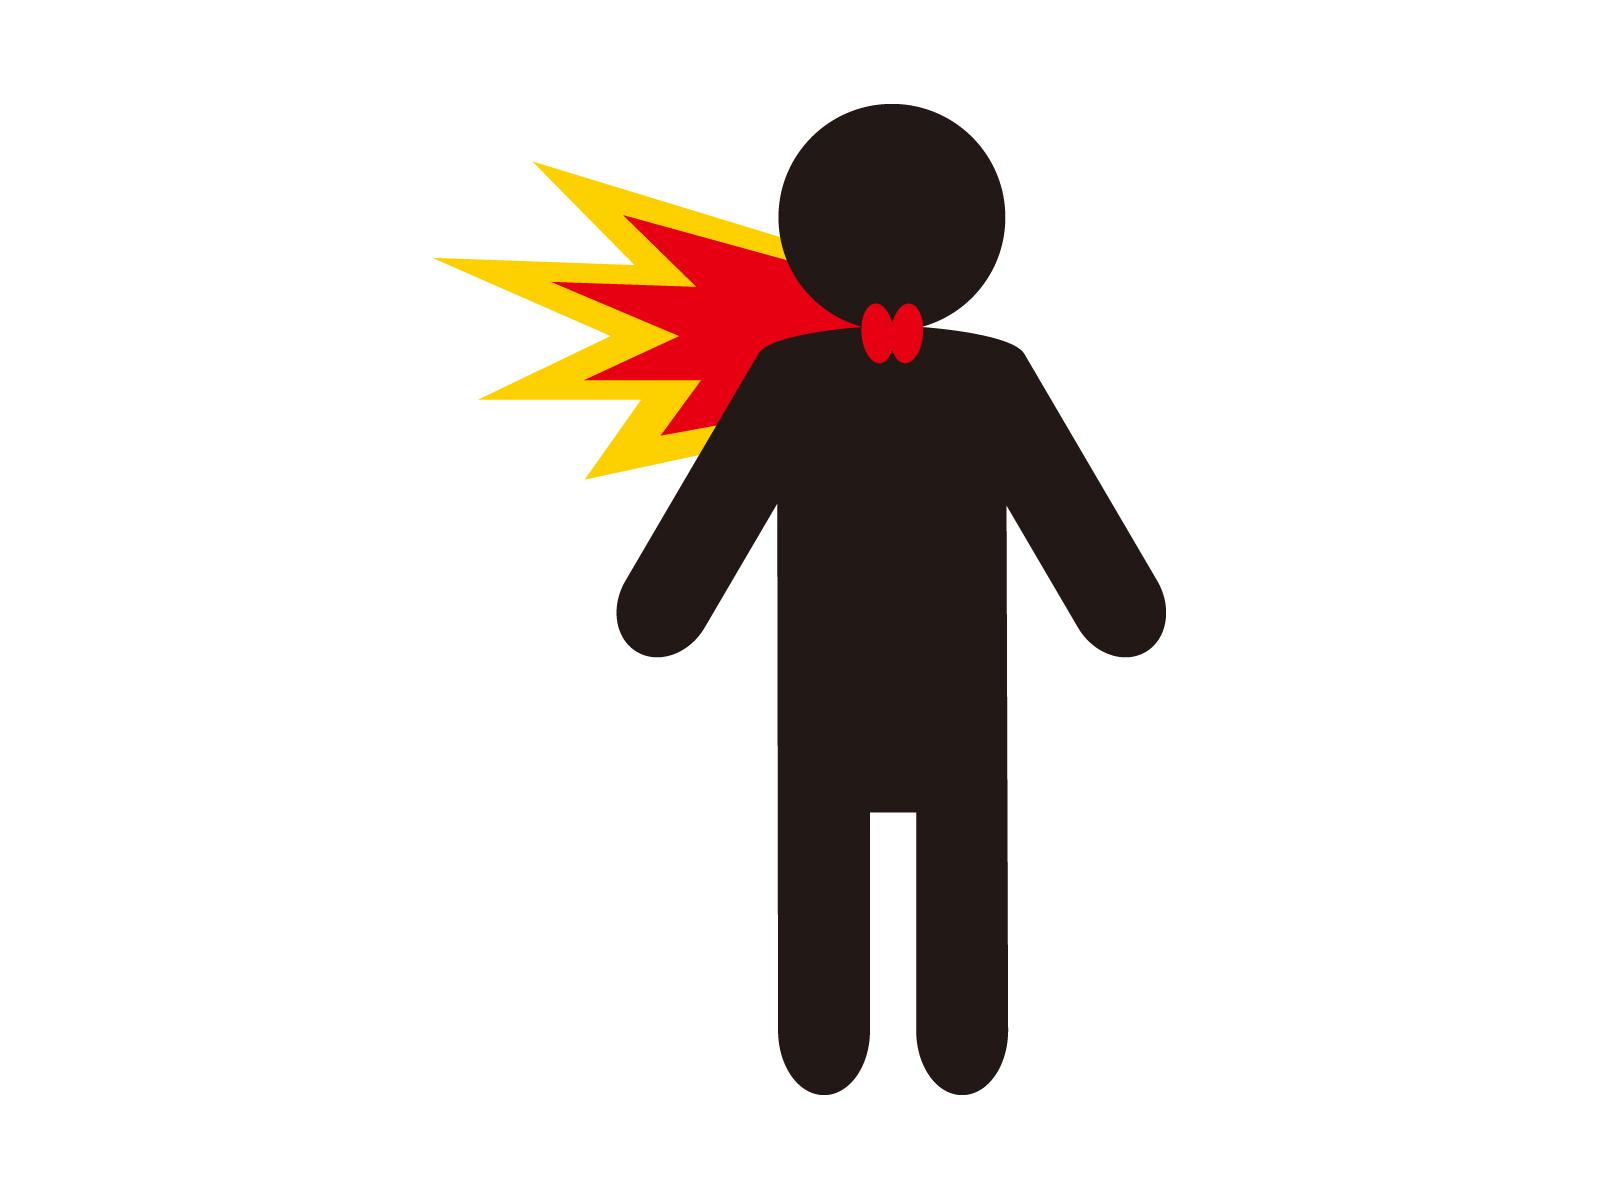 福島県小児科医会が甲状腺検査縮小の要望書を提出